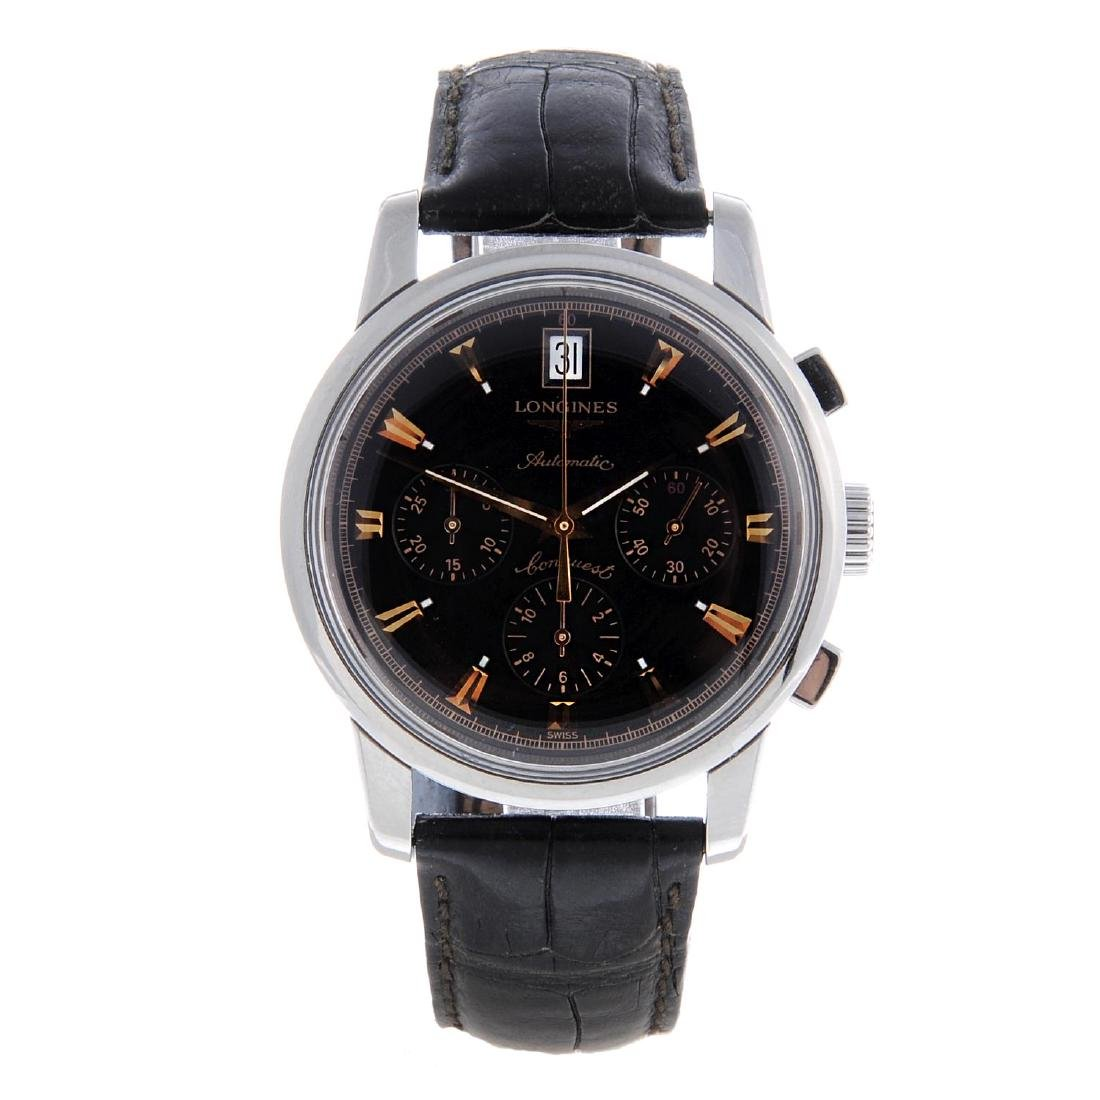 LONGINES - a gentleman's Conquest chronograph wrist